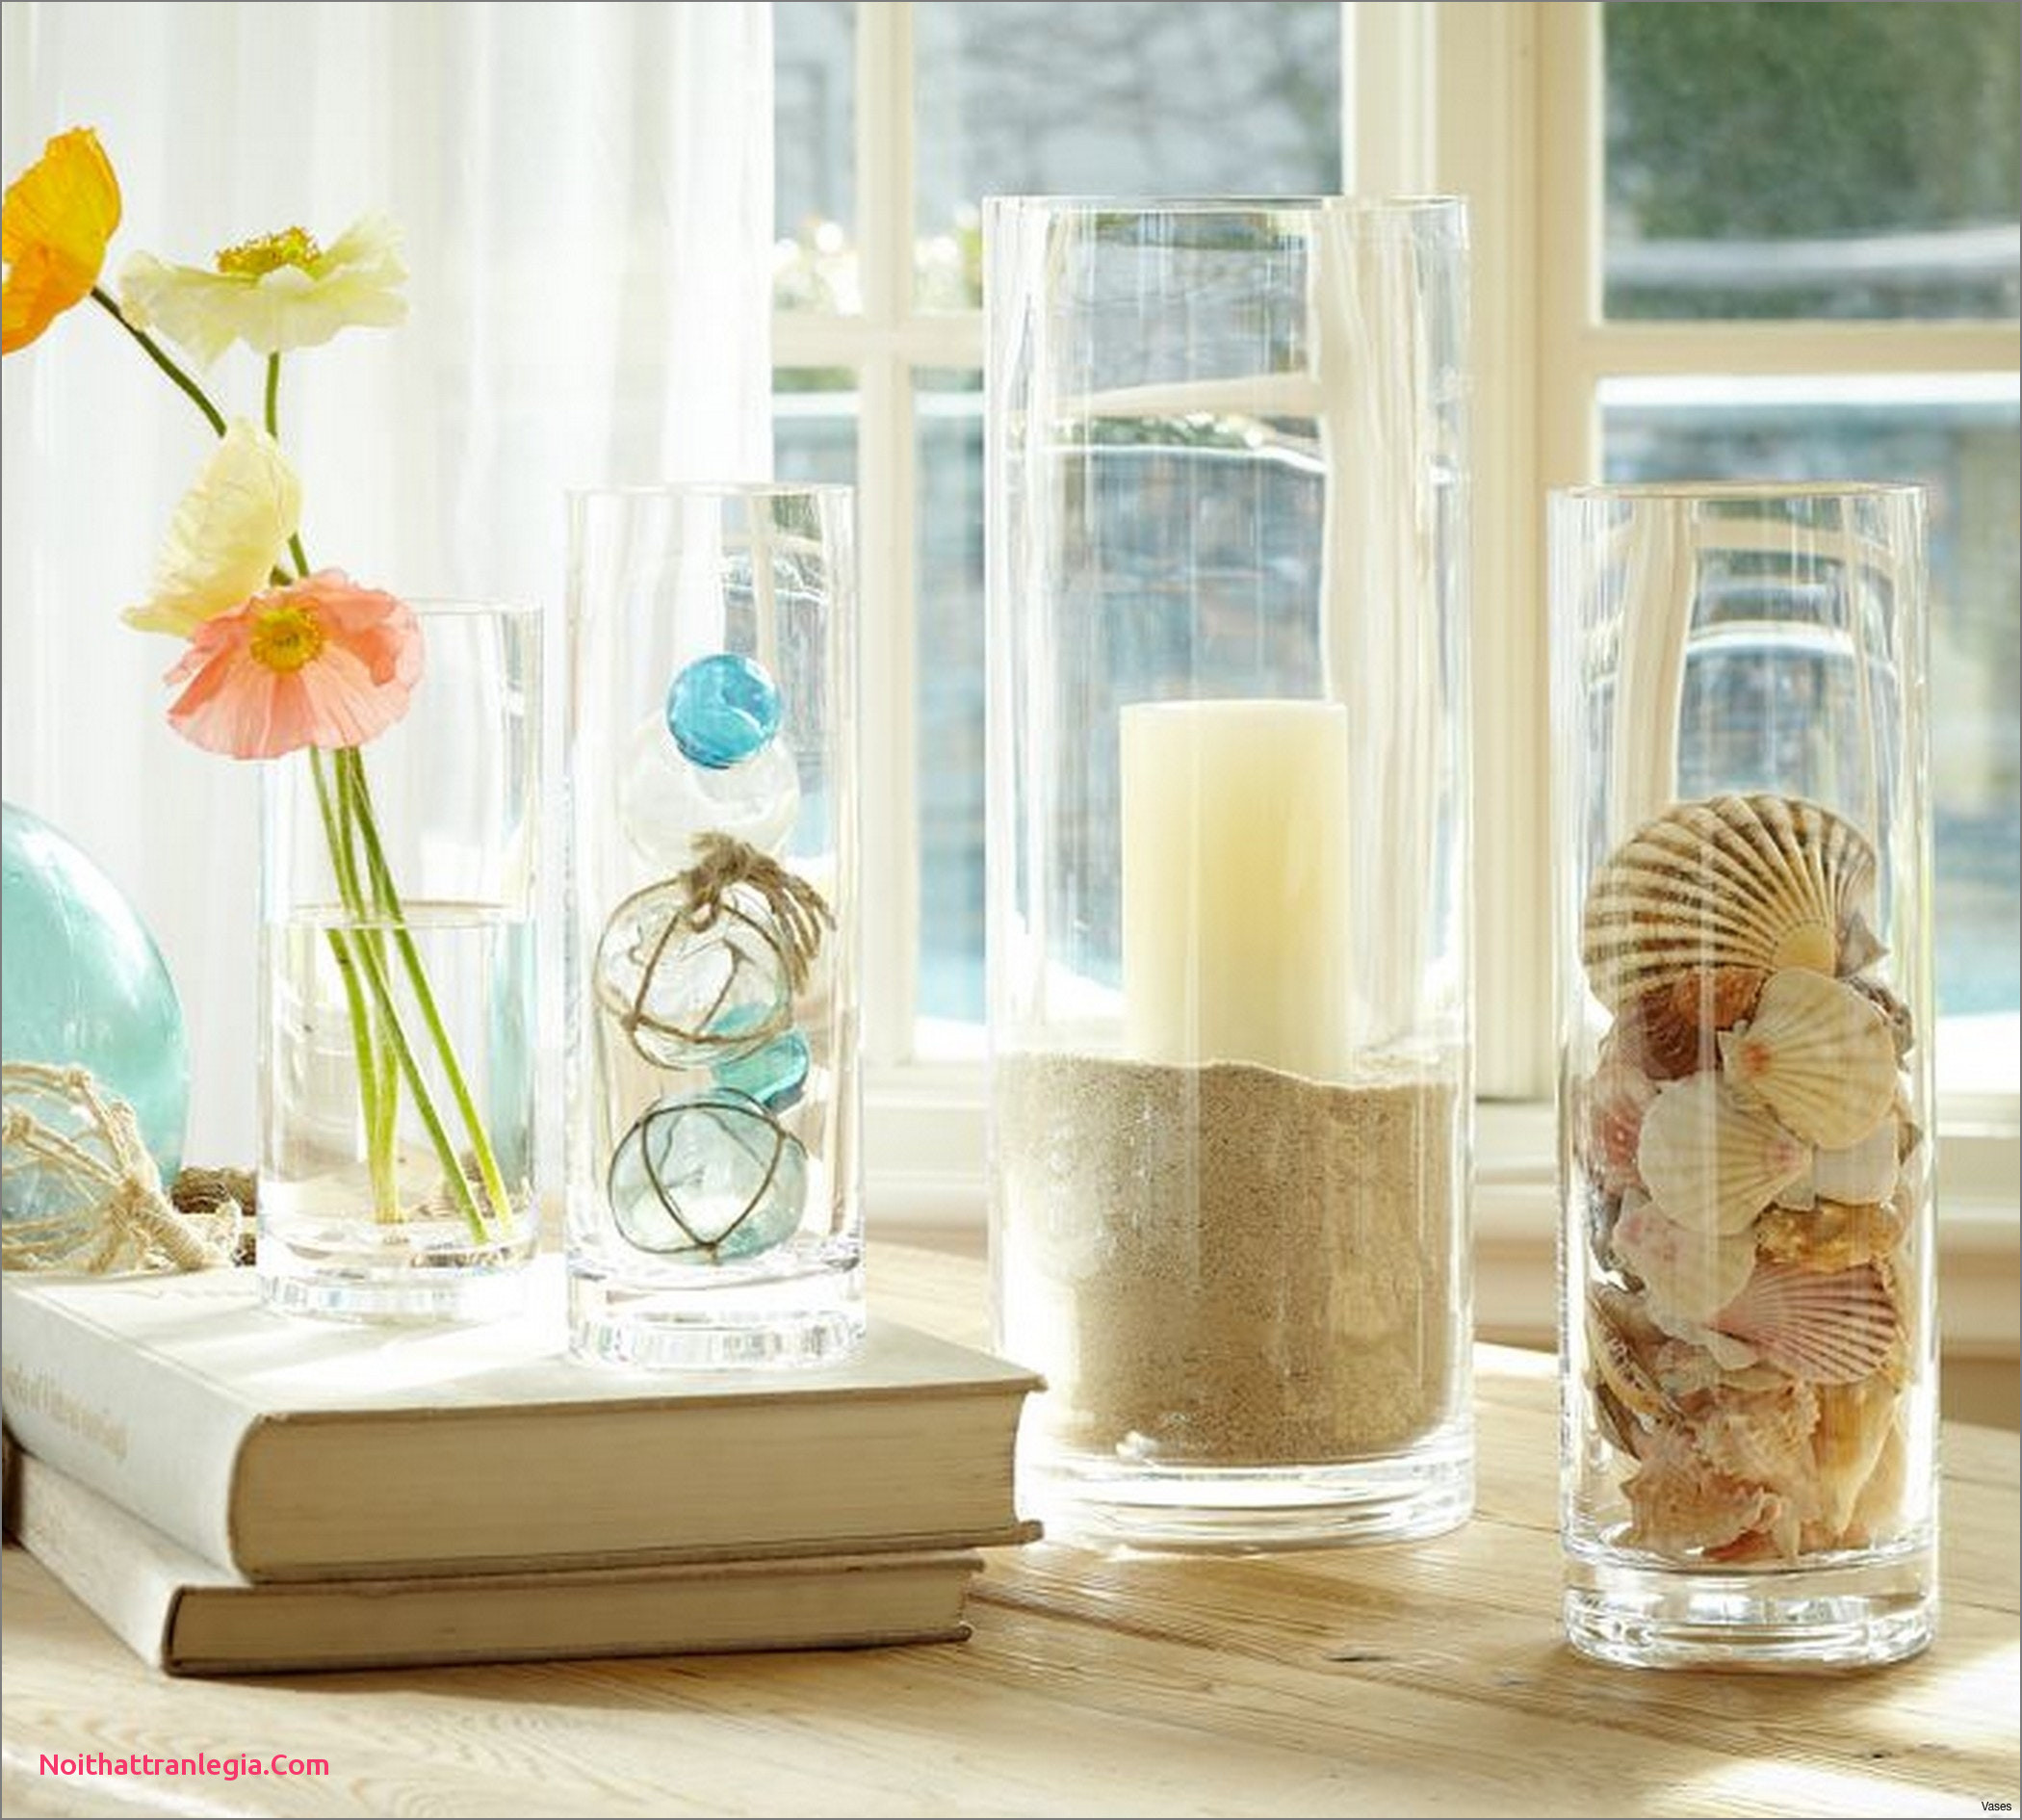 cut glass vases wholesale of 20 how to make mercury glass vases noithattranlegia vases design inside glass vase fillers vase filler ideas 5h vases summer 5i 0d inspiration vase